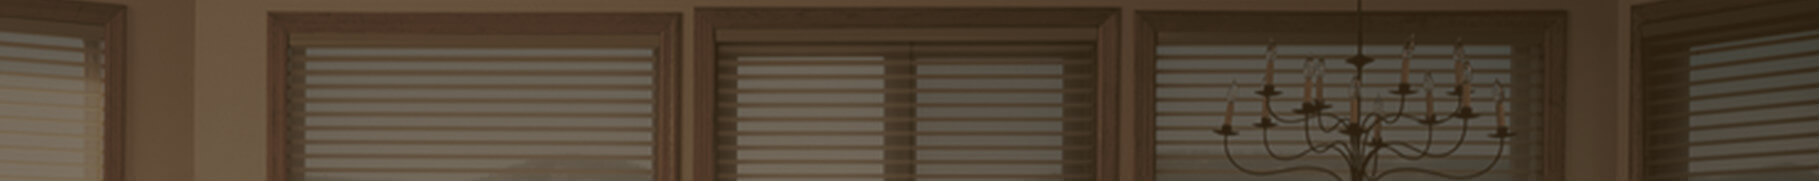 custom window shades in a dining room